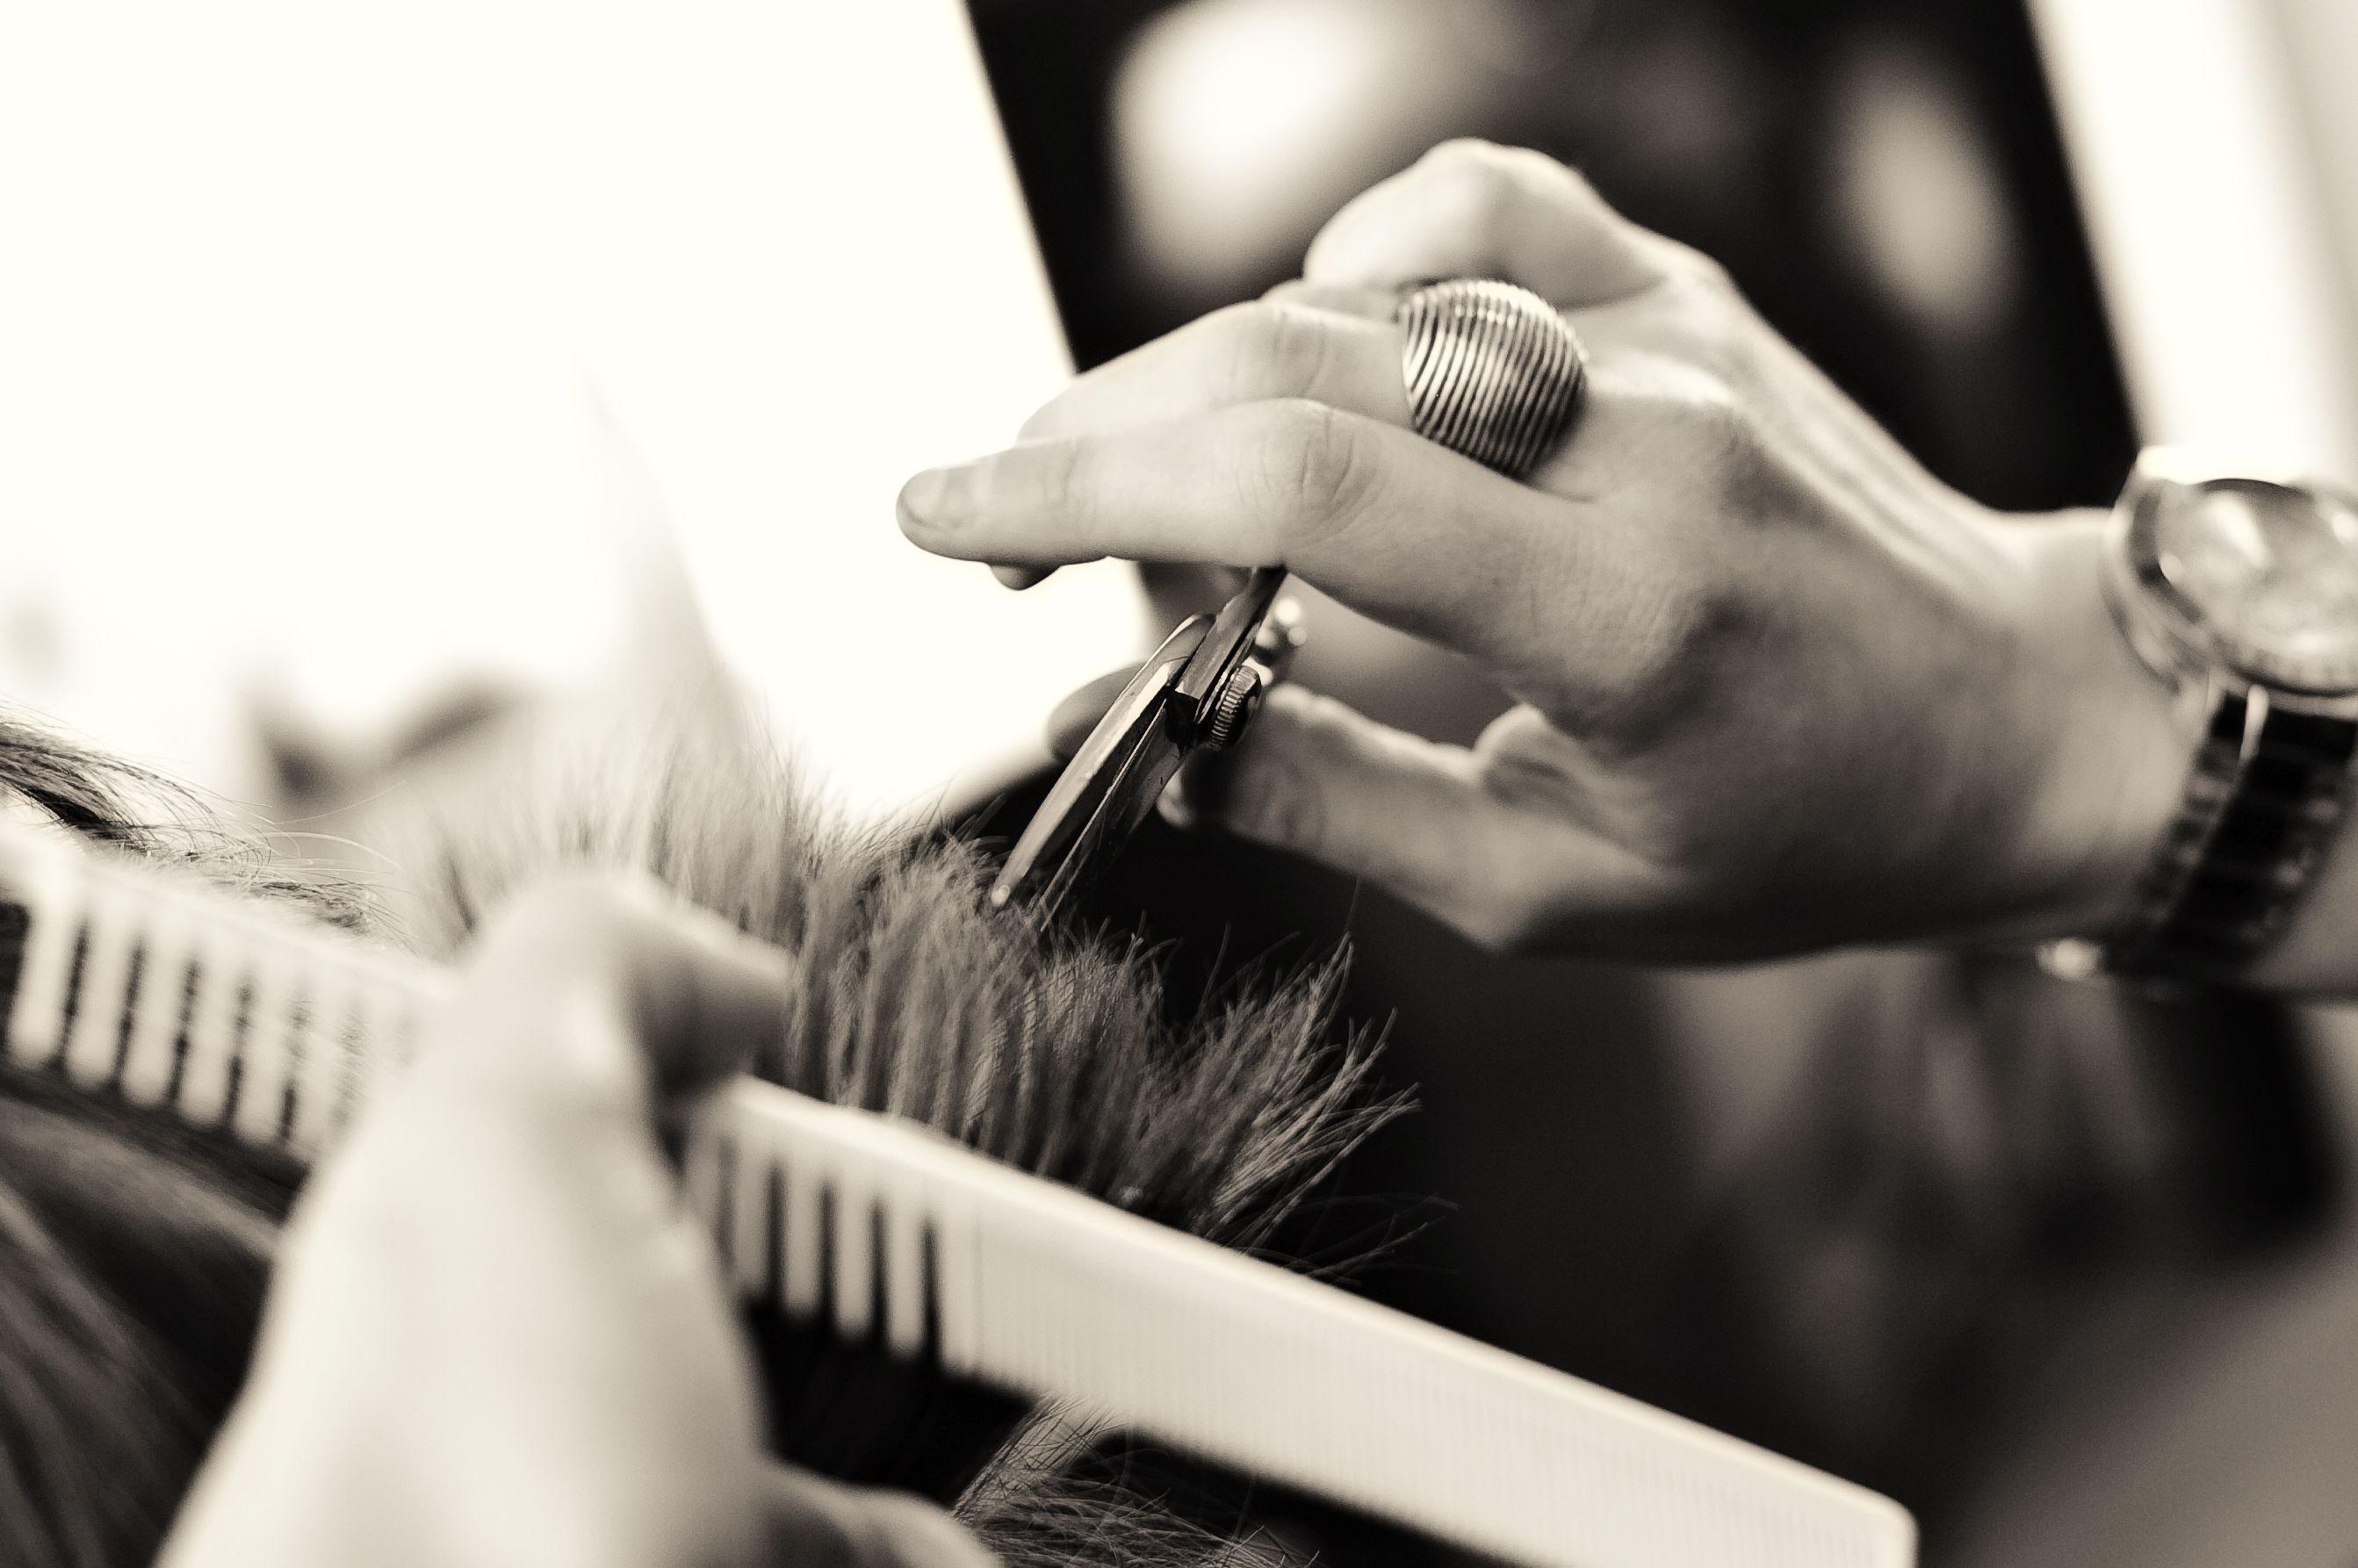 Hair Cutting Pics : Cut each others hair (or learn how!) Date Night/Family Fun Pinte ...